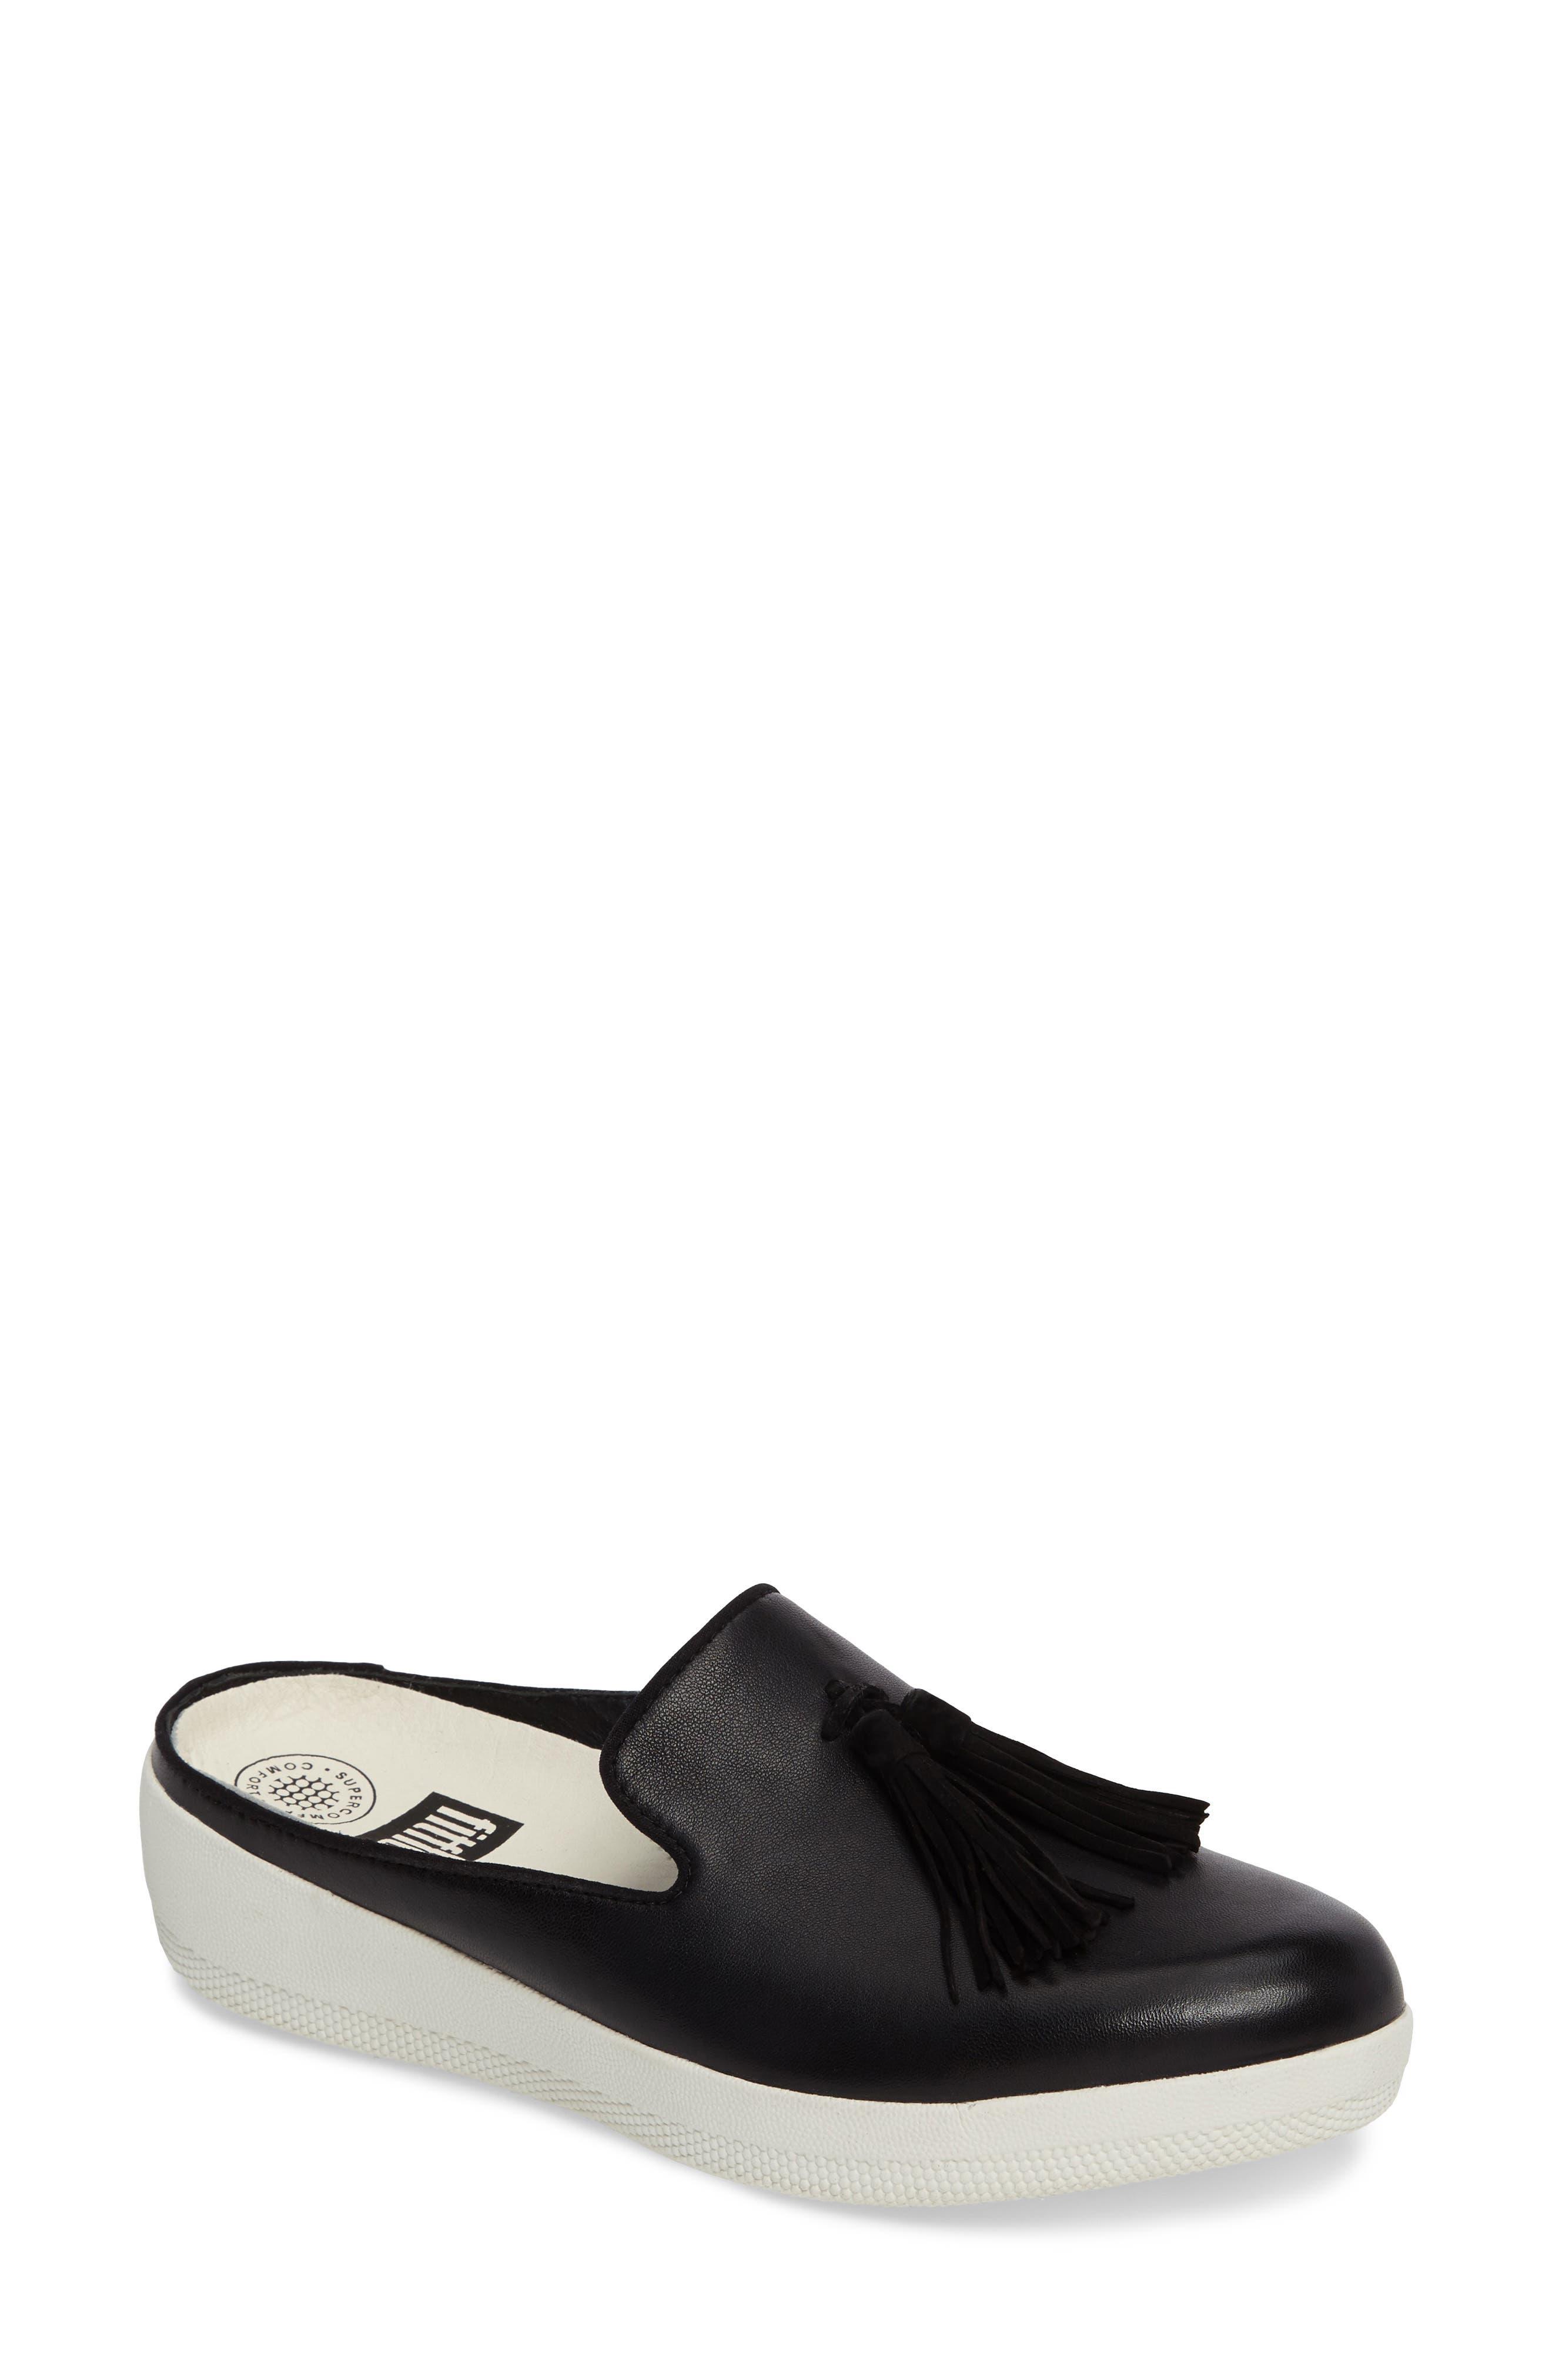 Main Image - FitFlop Superskate Tasseled Loafer Mule (Women)